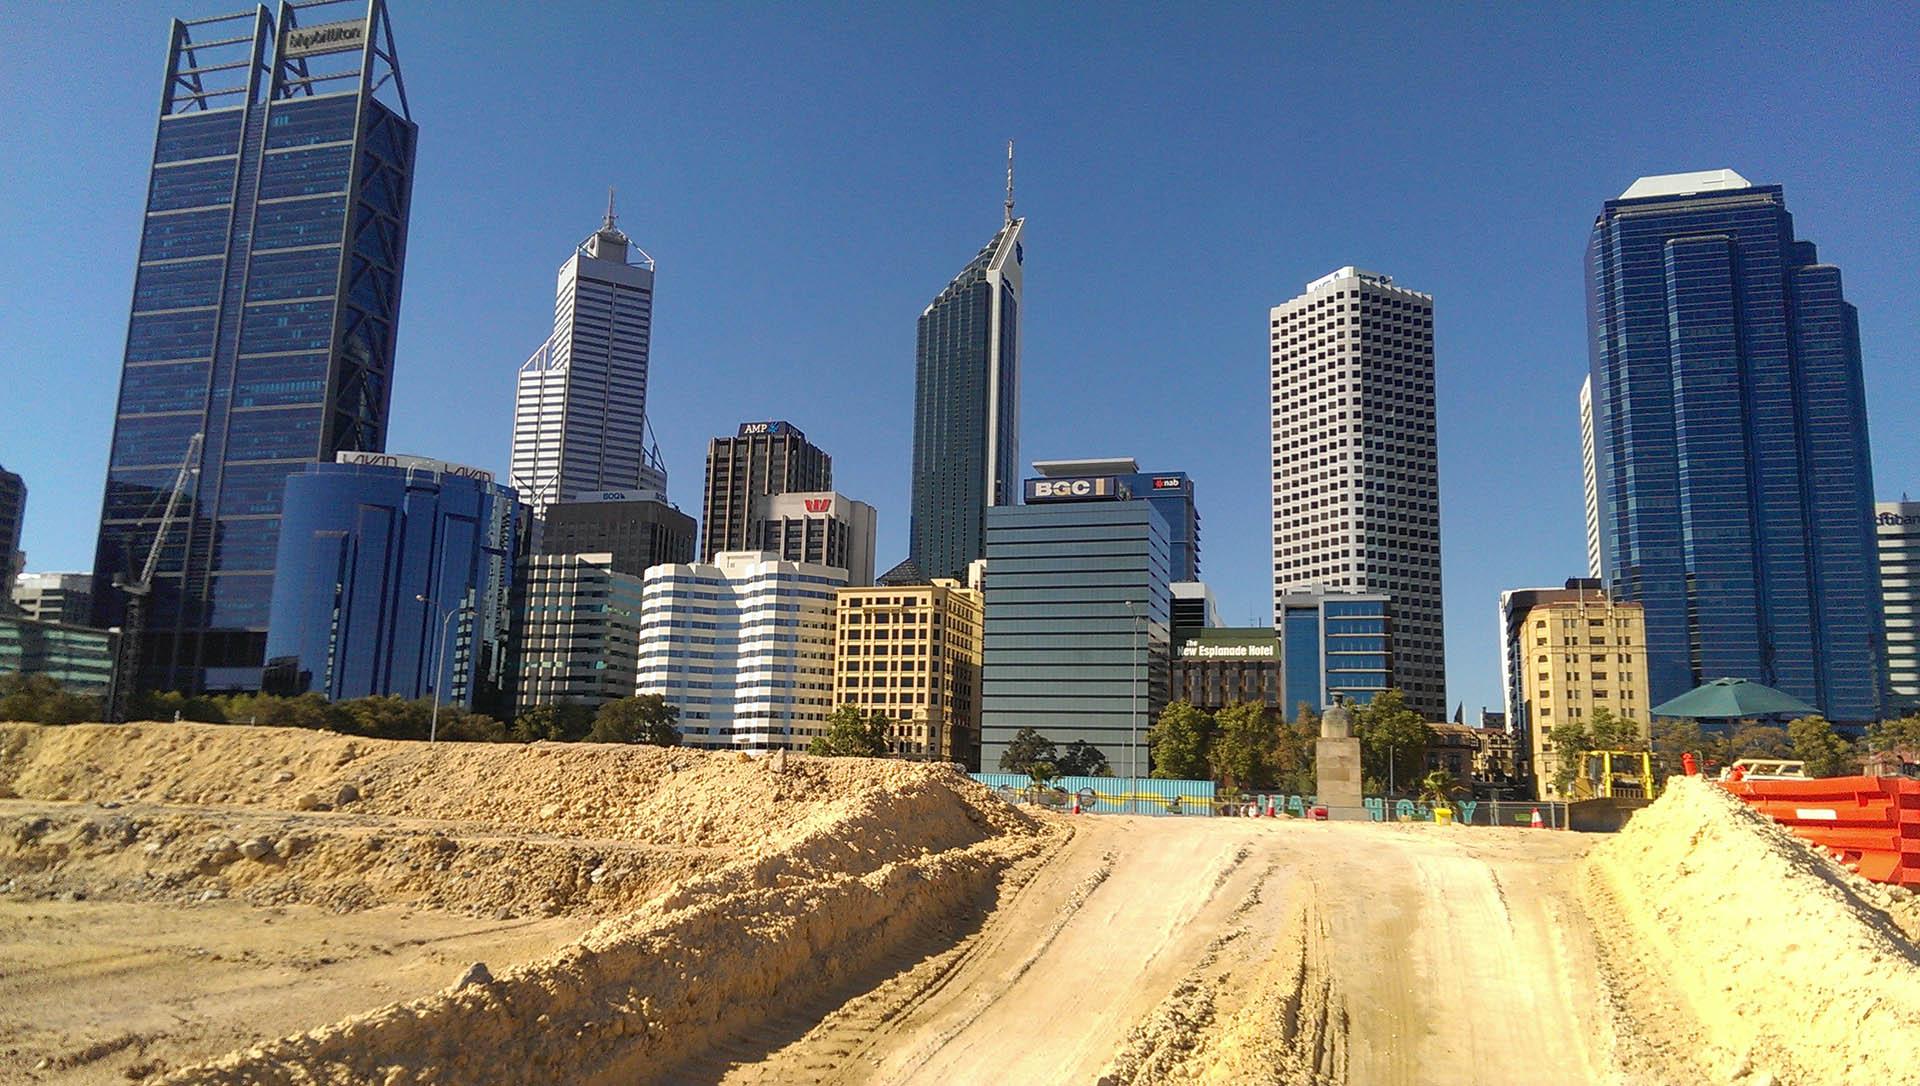 A 44 million dollar development zone